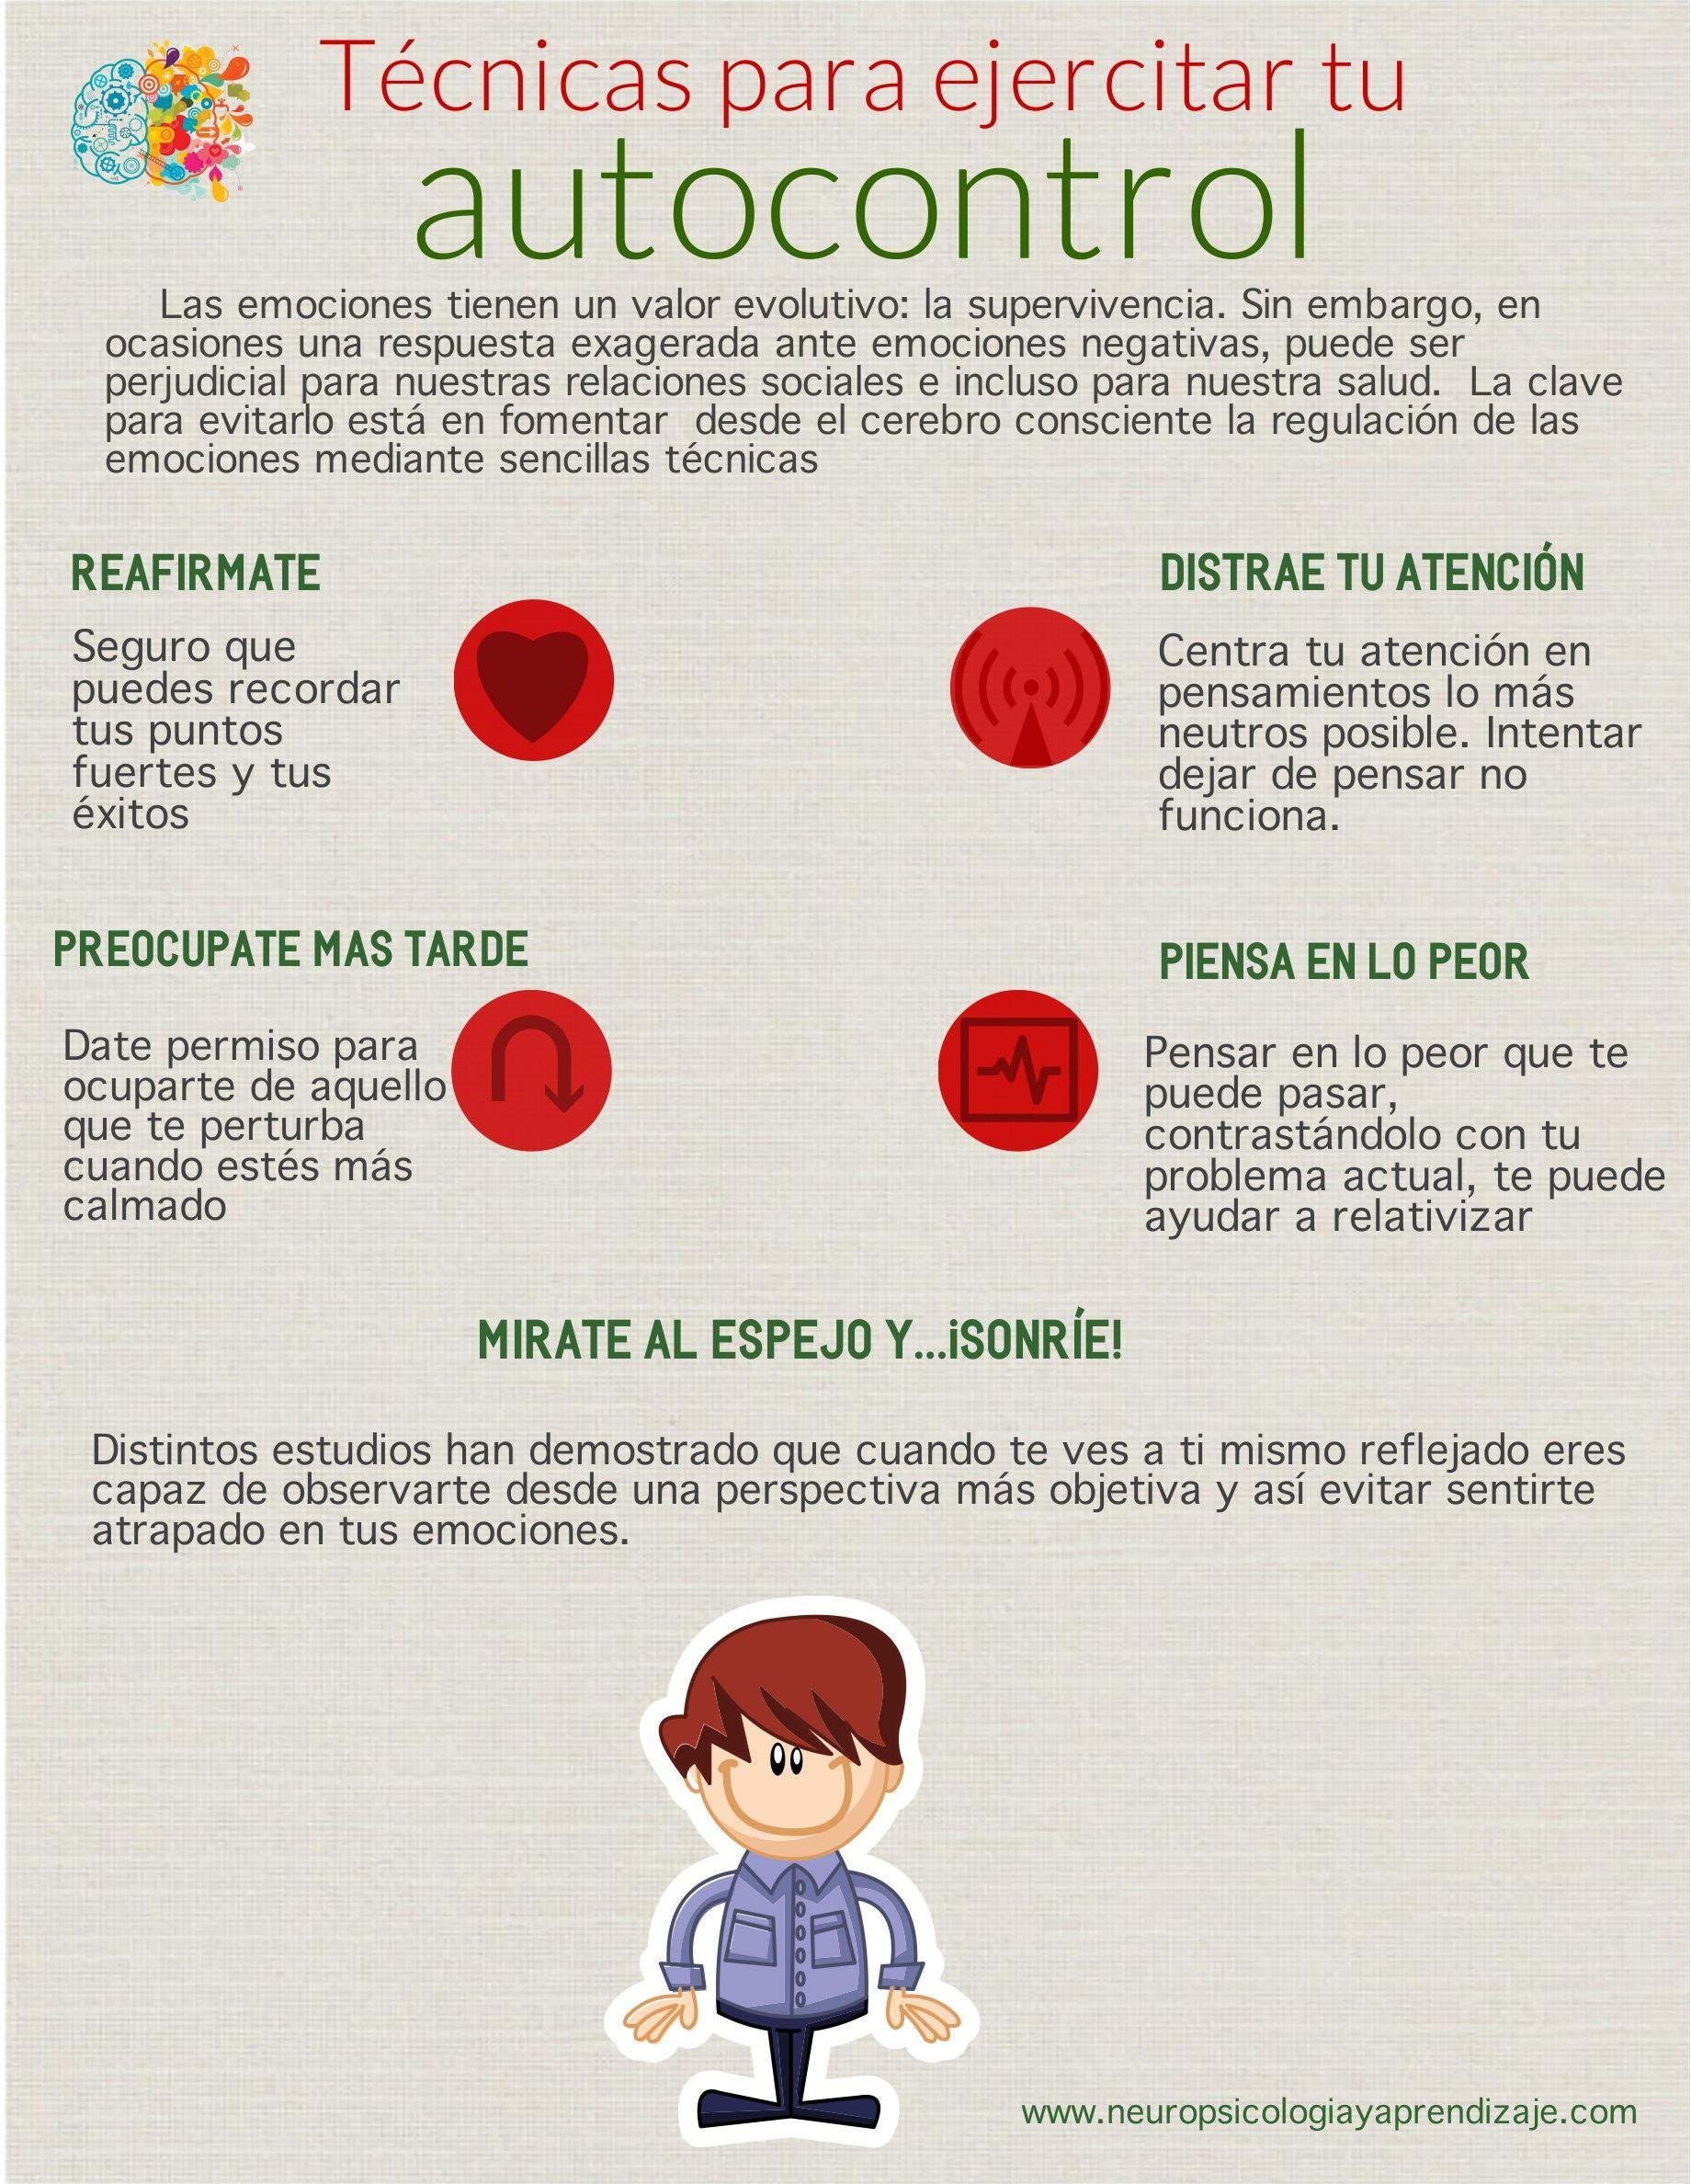 Ejercitar Autocontrol Emocional Mario Characters School Counselor Psychology